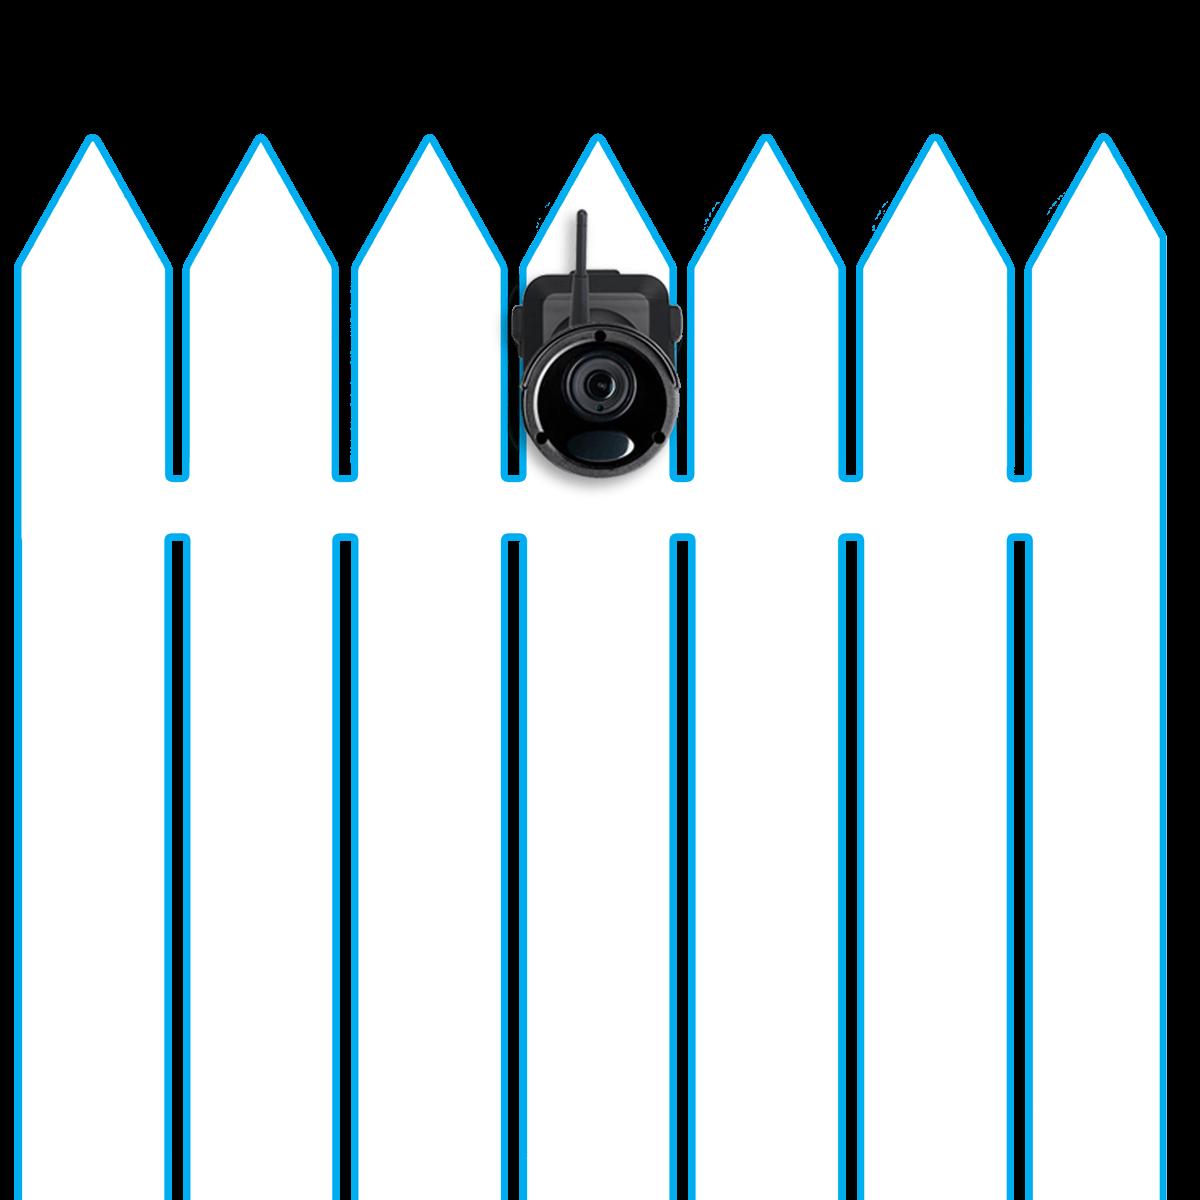 wire-free security camera wireless range